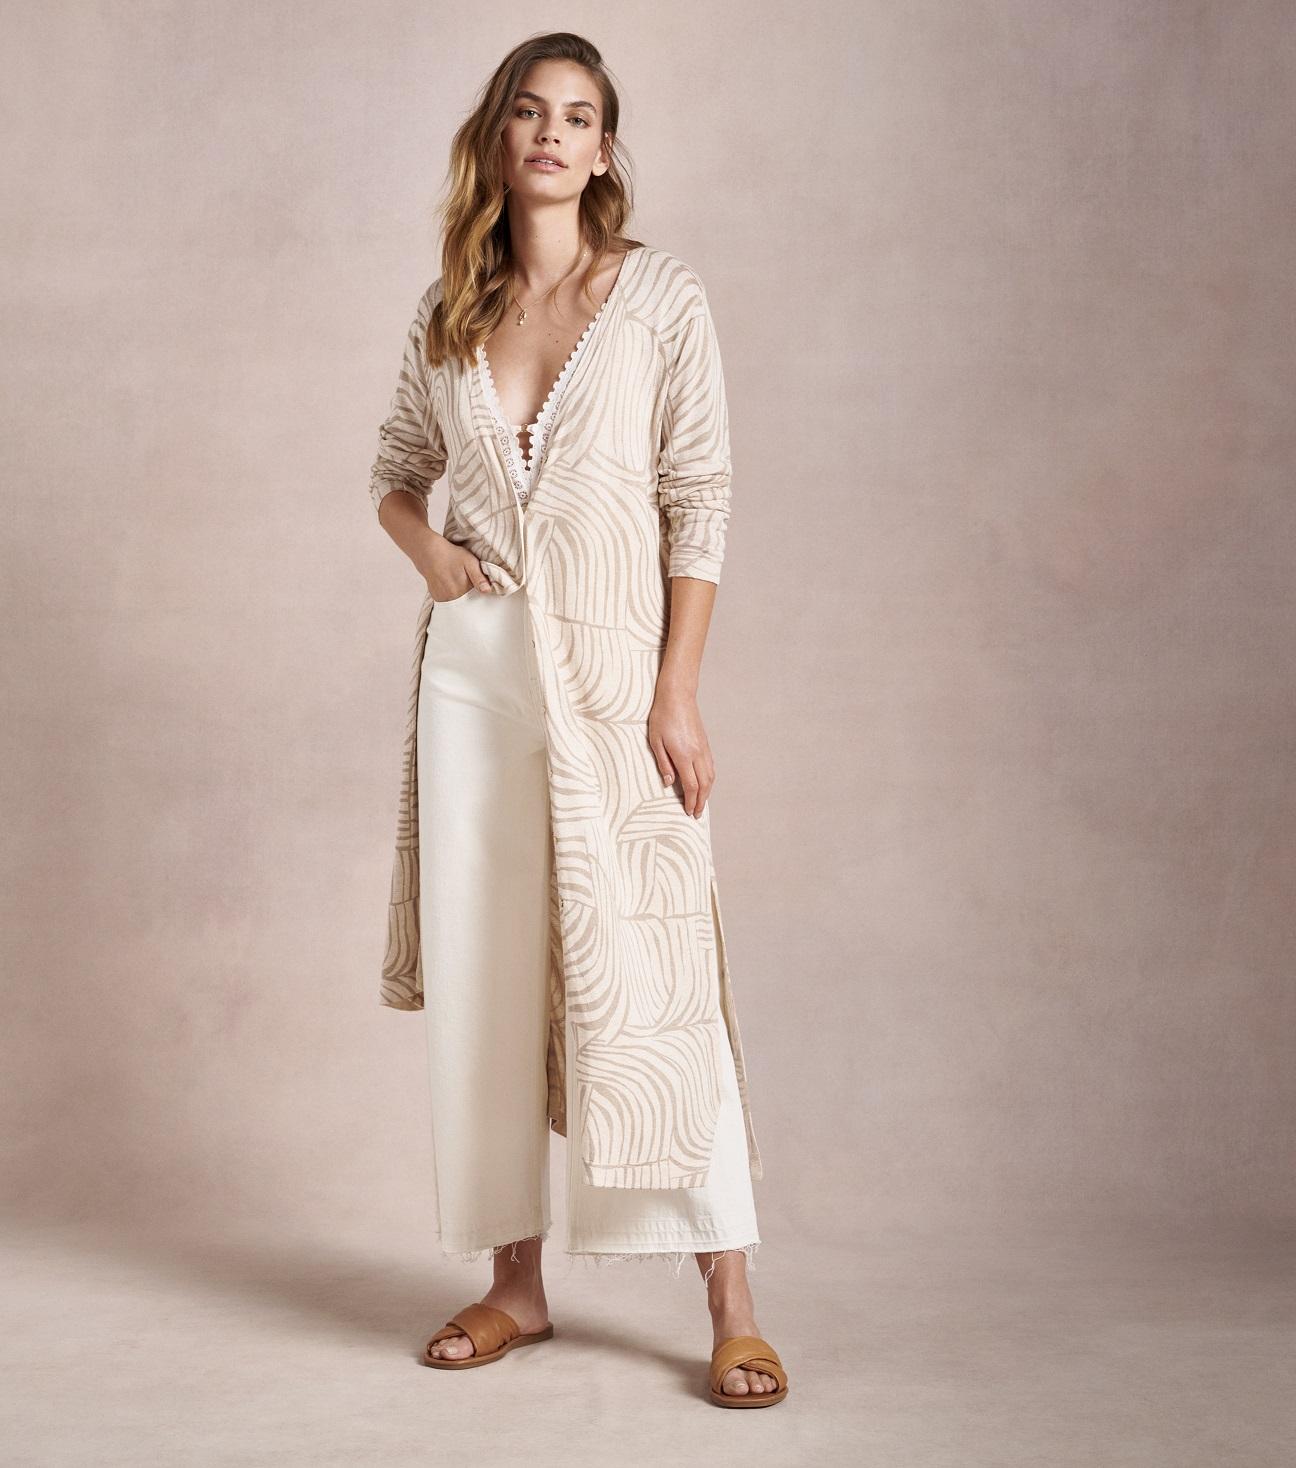 MS High Summer 2020 Womenswear 1